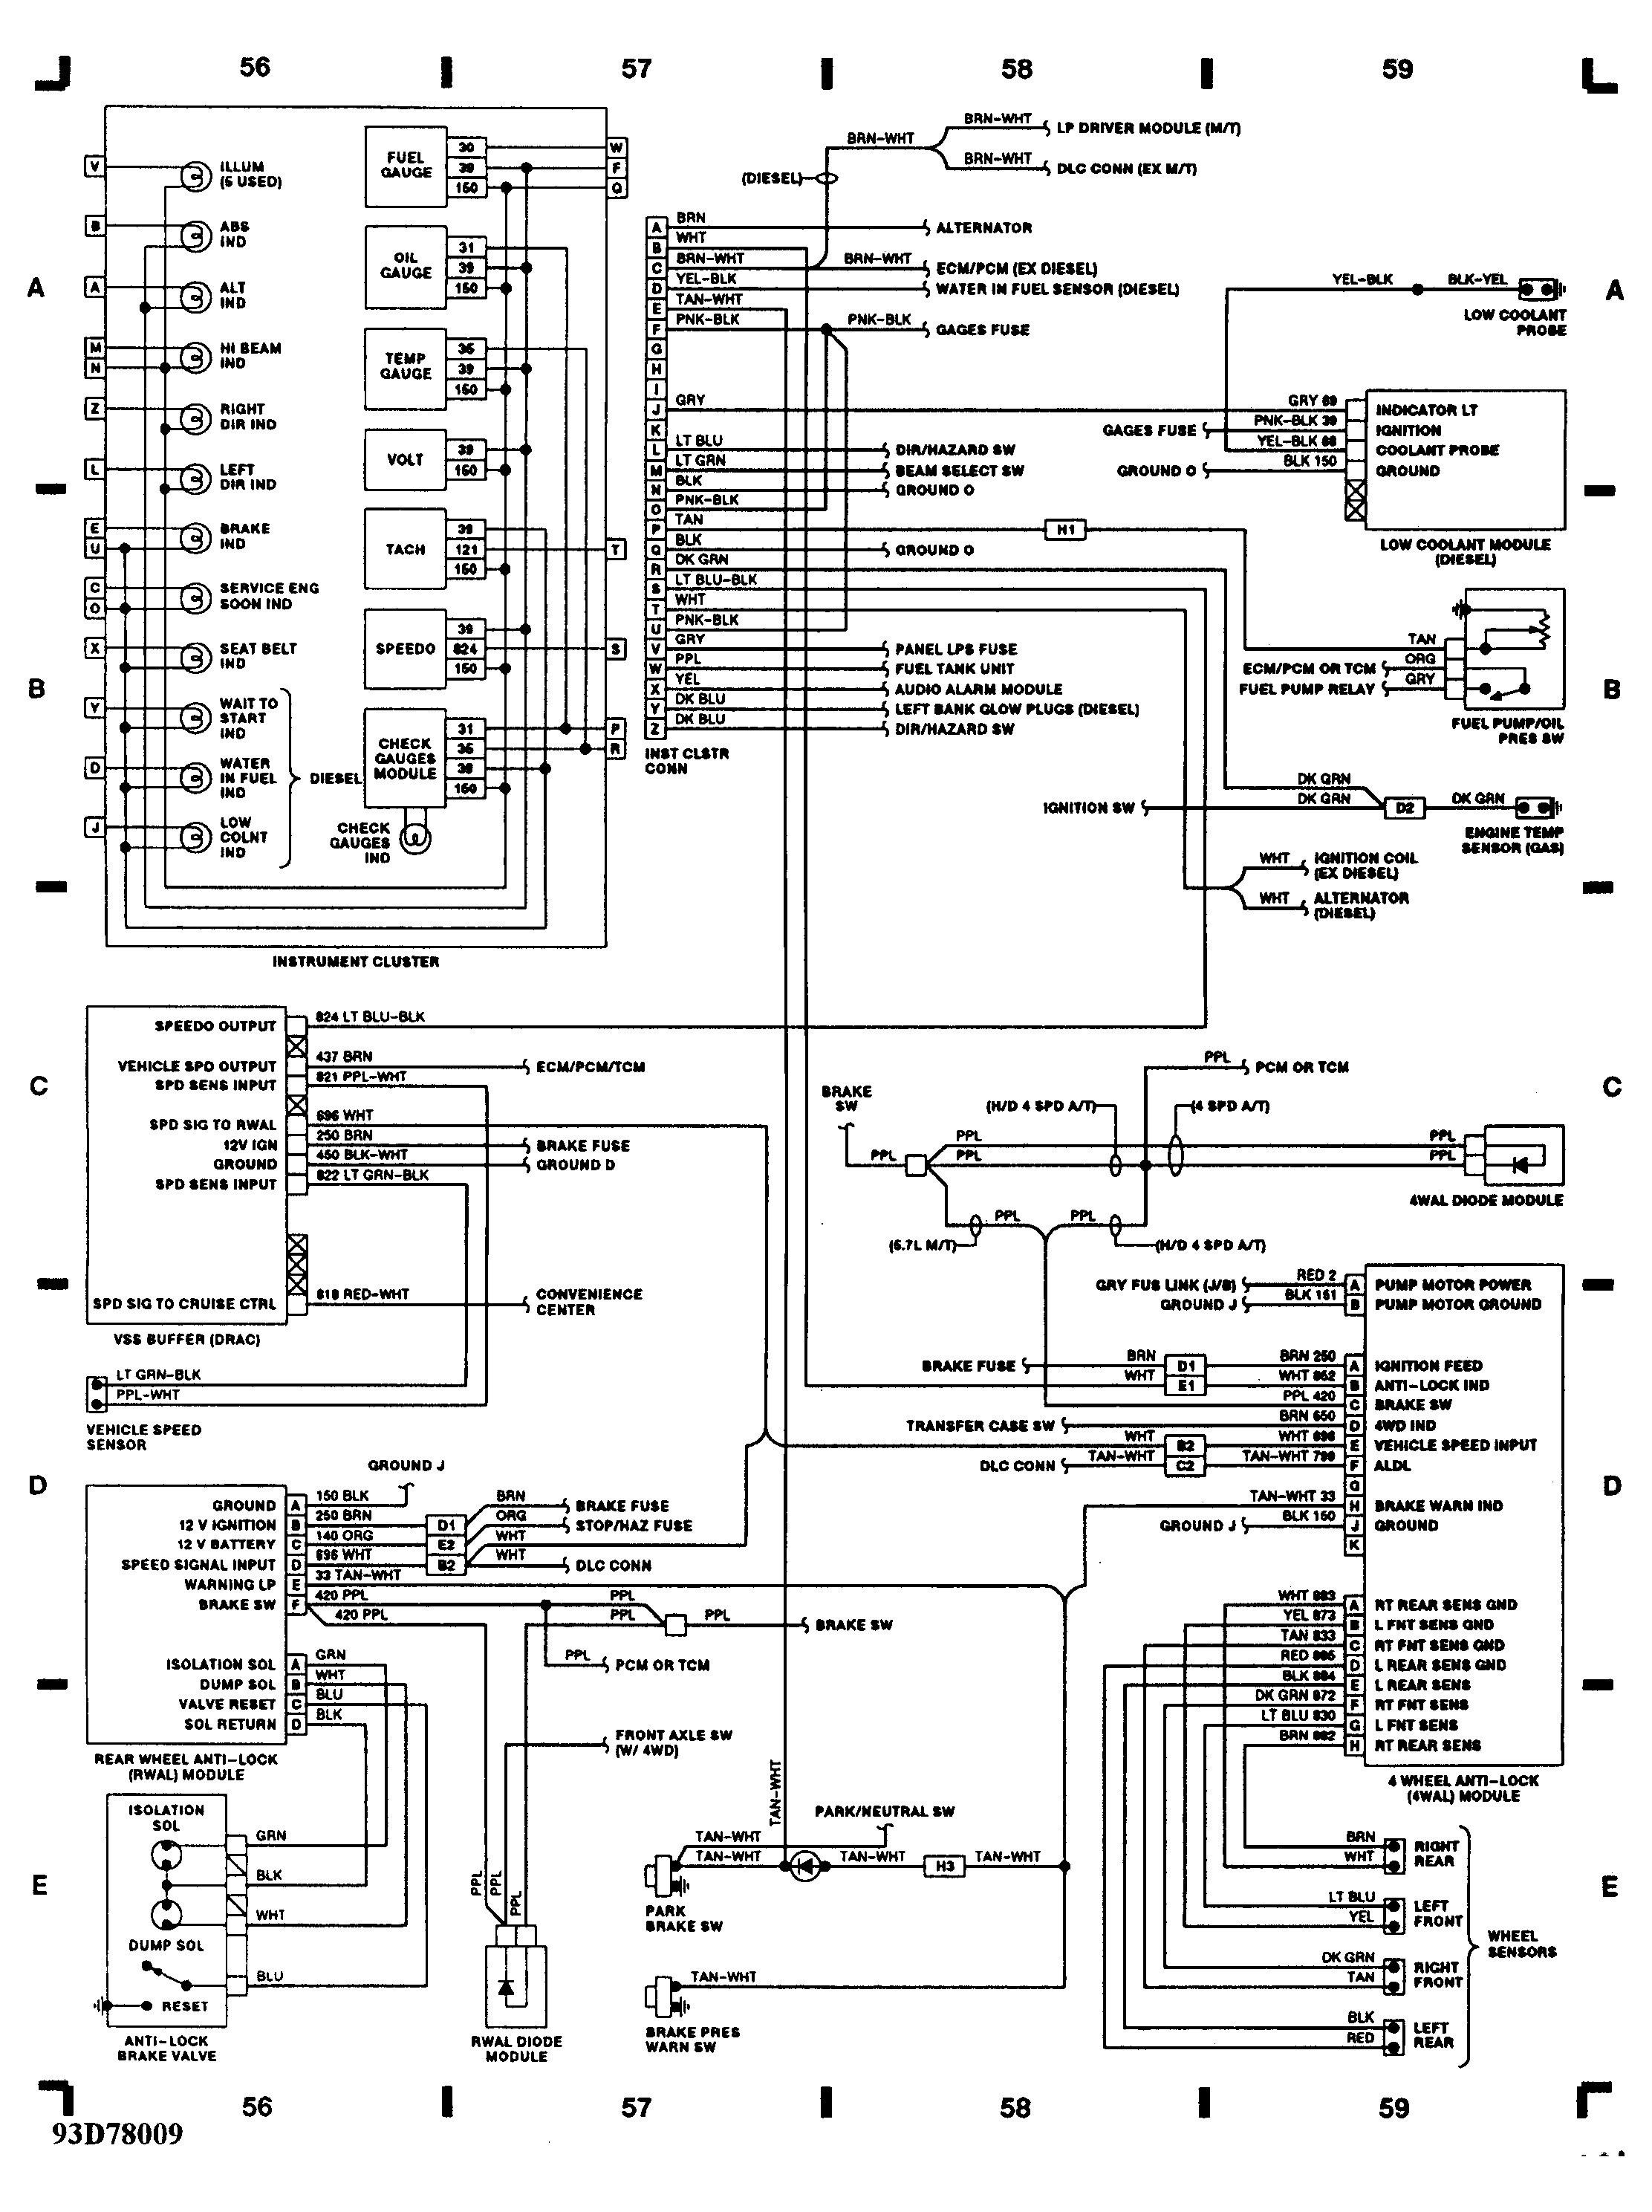 Ohc Engine Diagram 2002 Ls1 Engine Diagram Another Blog About Wiring Diagram • Of Ohc Engine Diagram